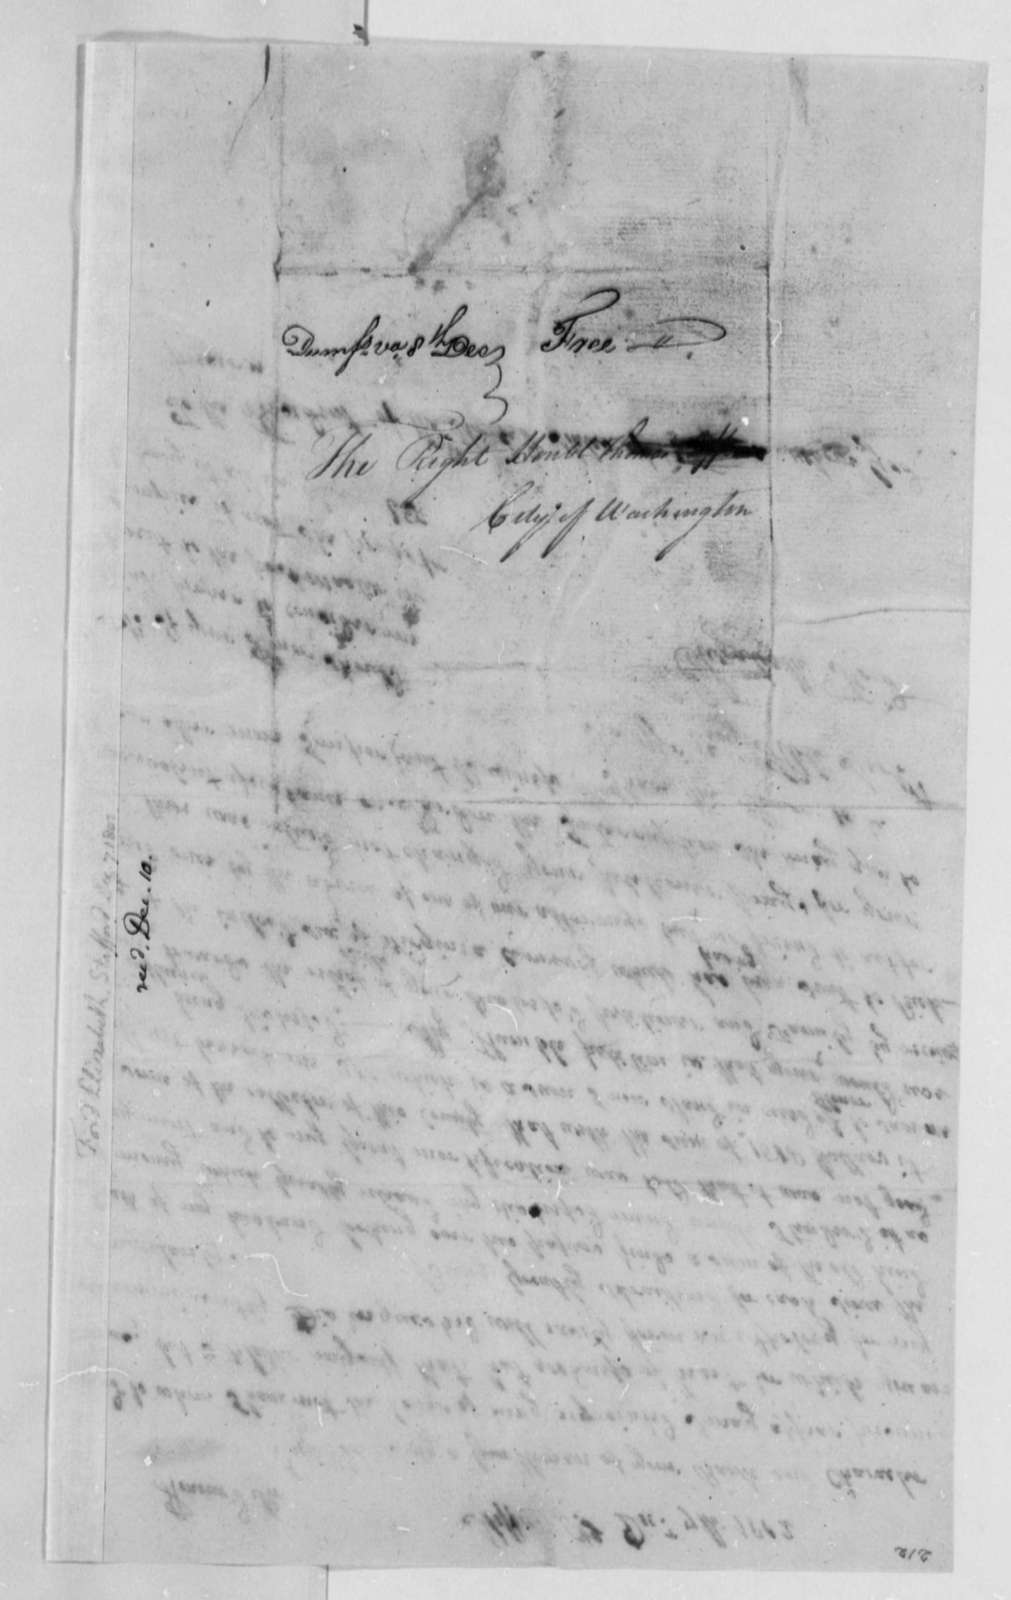 Elizabeth Ford to Thomas Jefferson, December 7, 1802